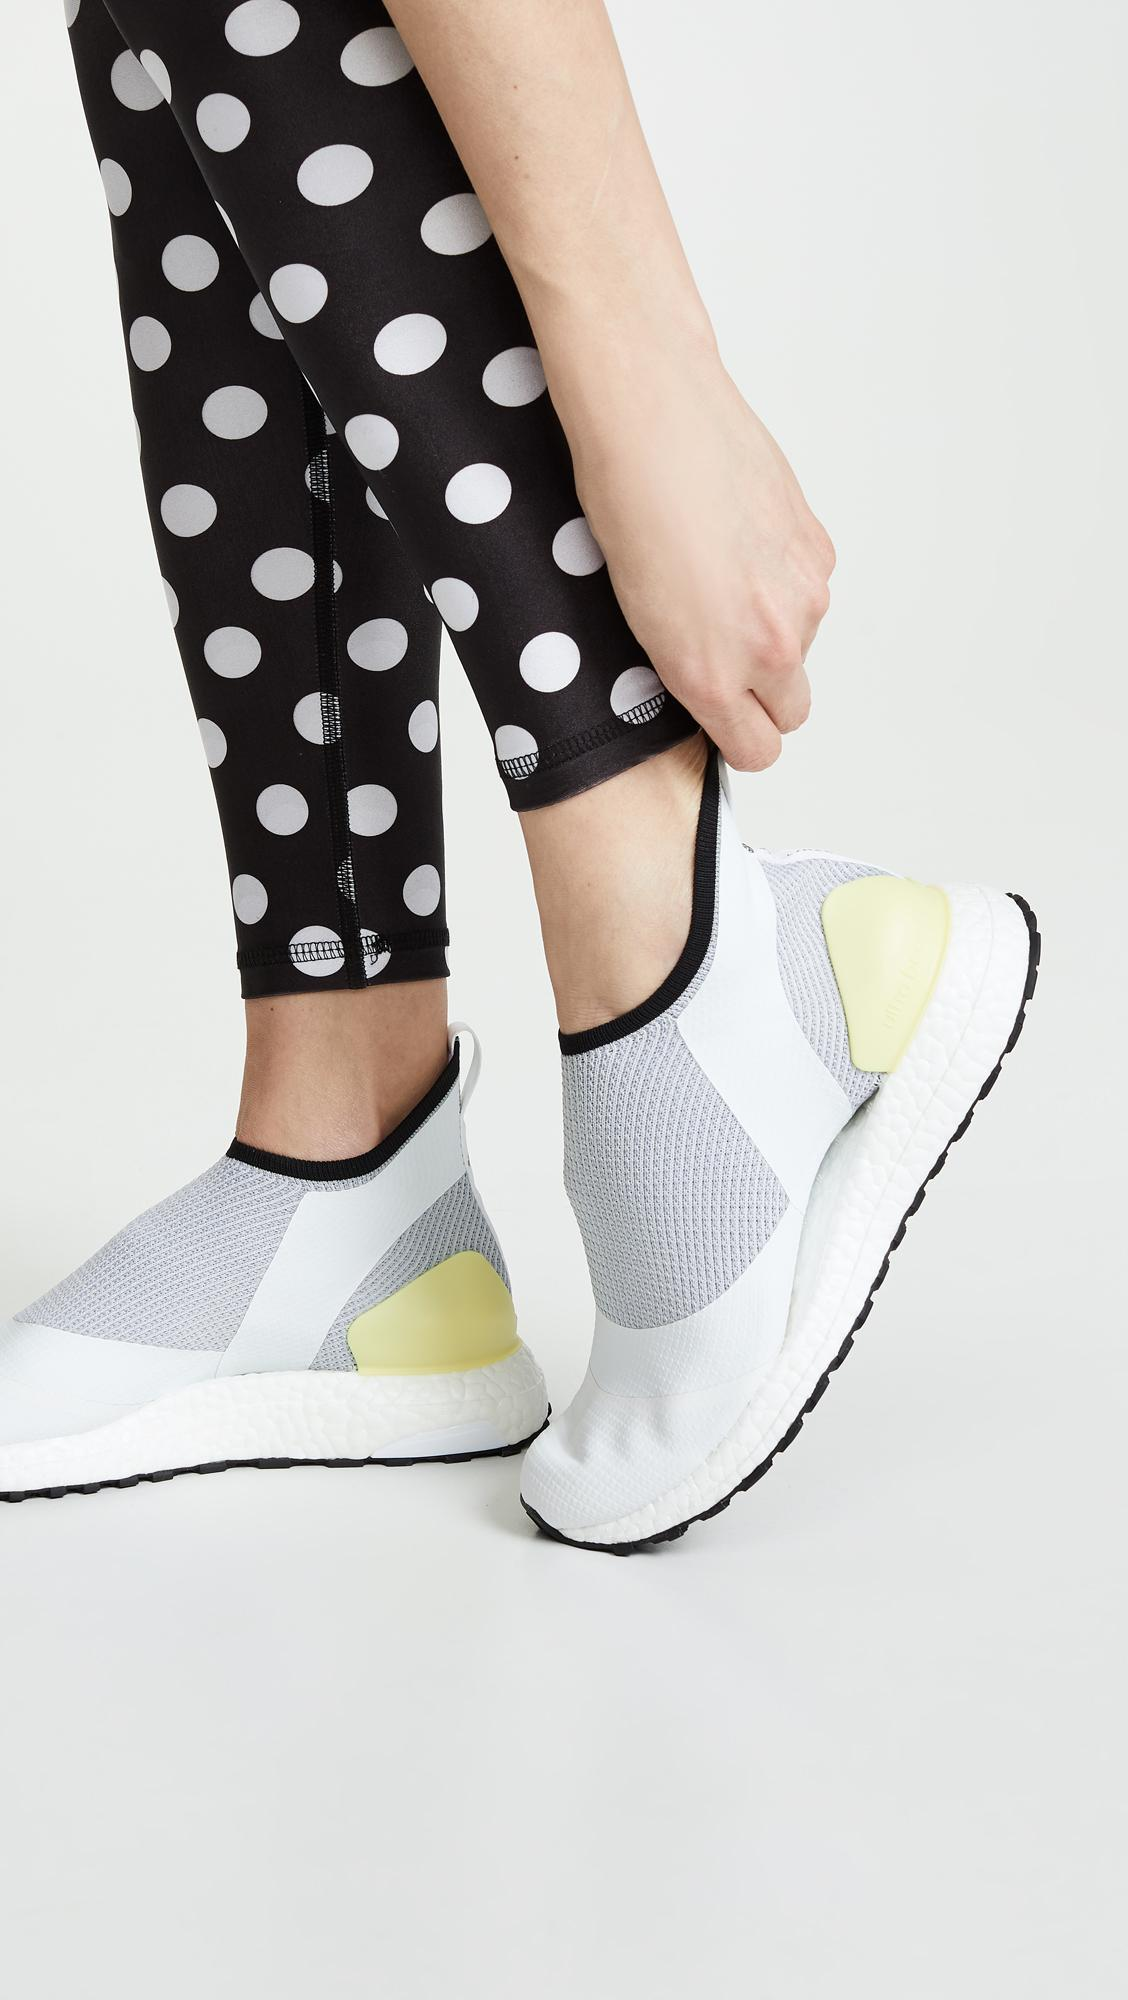 658db783450 Adidas By Stella McCartney - White Ultraboost X All Terrain Sneakers -  Lyst. View fullscreen